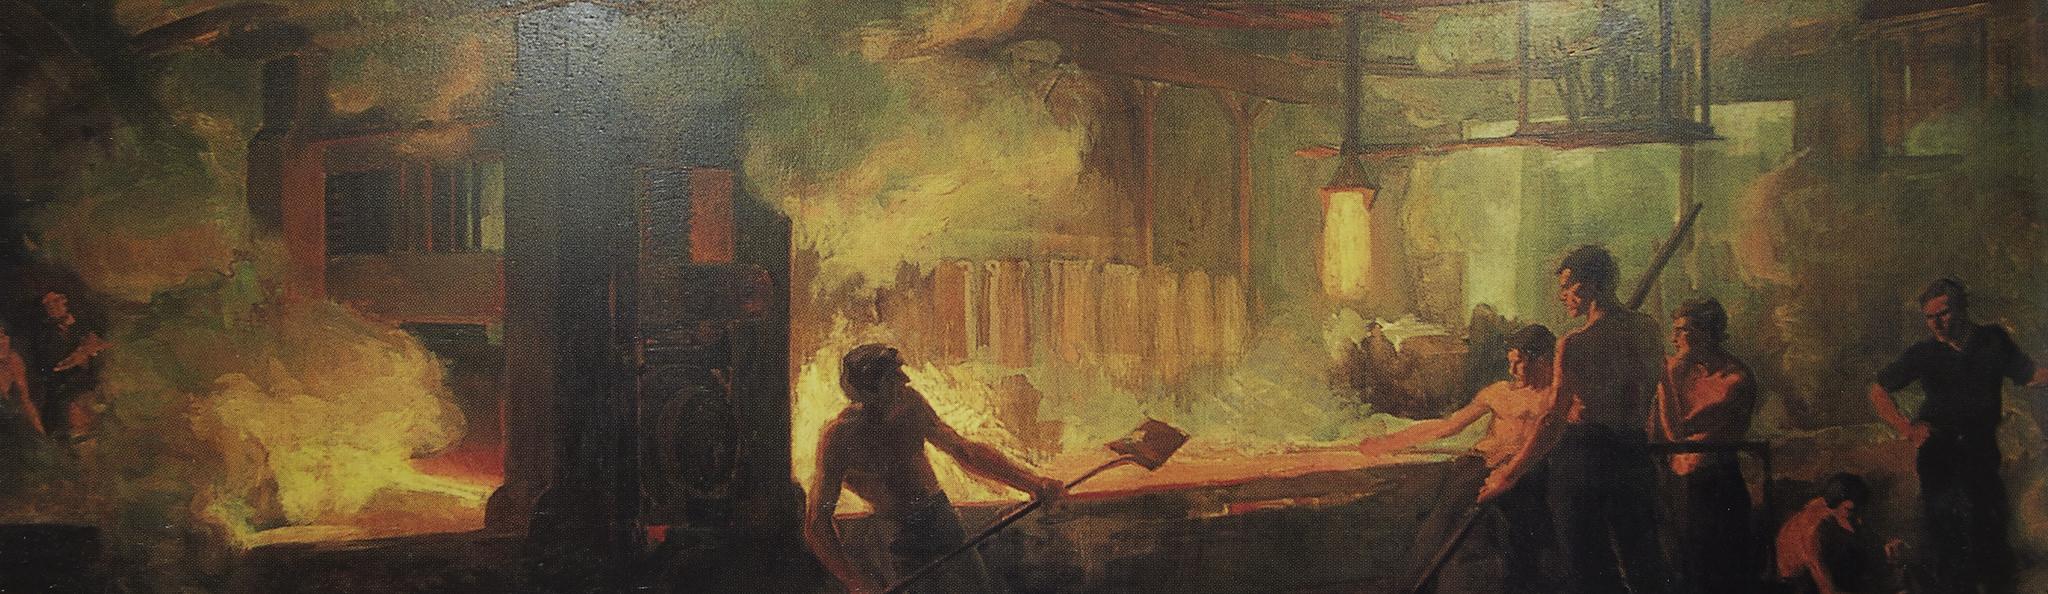 Margaret A. Hittle,  Steel Mill, 1909, Oil on canvas, 5' x 18'.